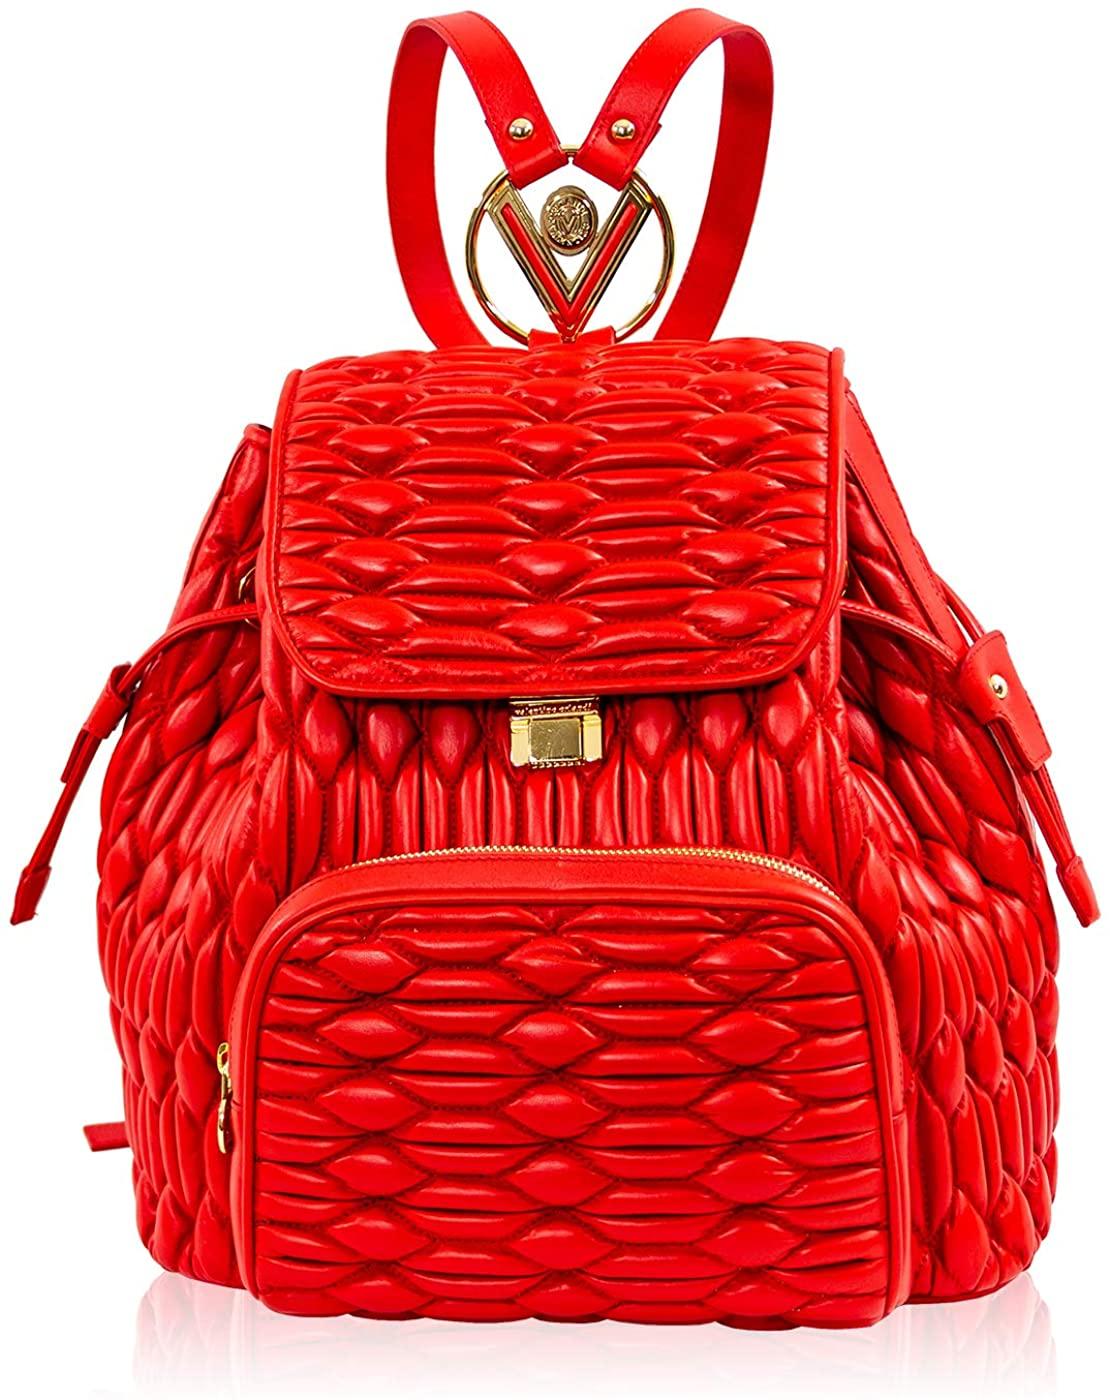 Valentino Orlandi Womens Large Handbag Backpack Italian Designer Purse Flame Scarlet Red Genuine Leather Tote Top Handle Satchel Sling Bucket Bag in Quilted Design